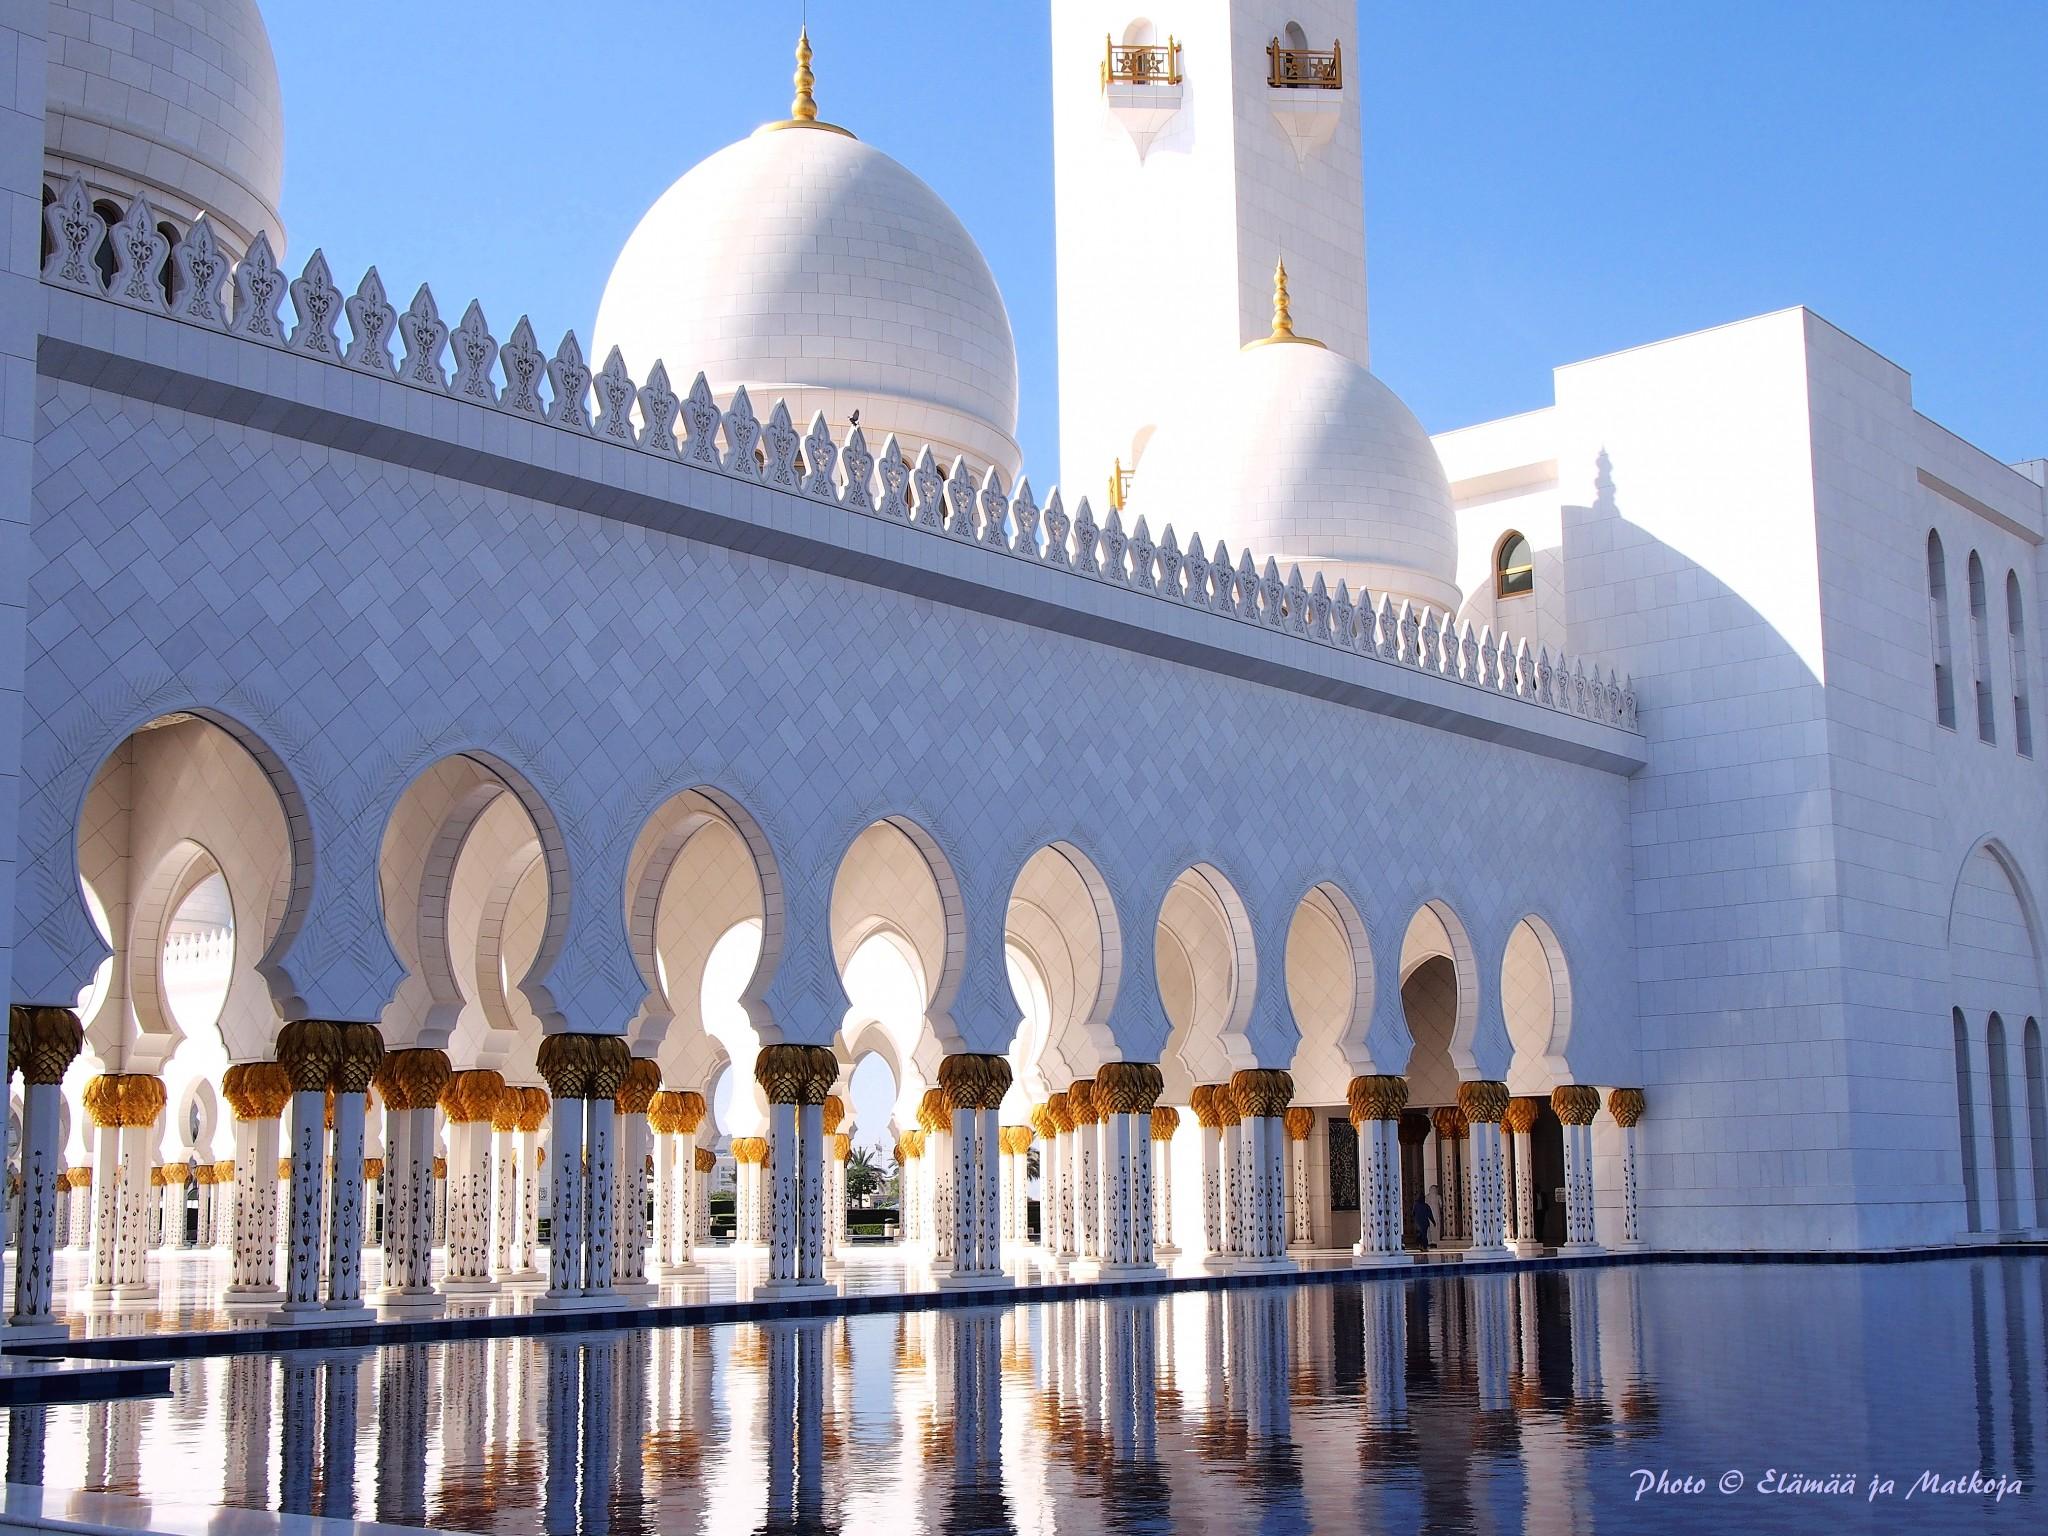 Sheikh Zayed Grand Mosque Abu Dhabi UAE 3 Photo © Elämää ja Matkoja